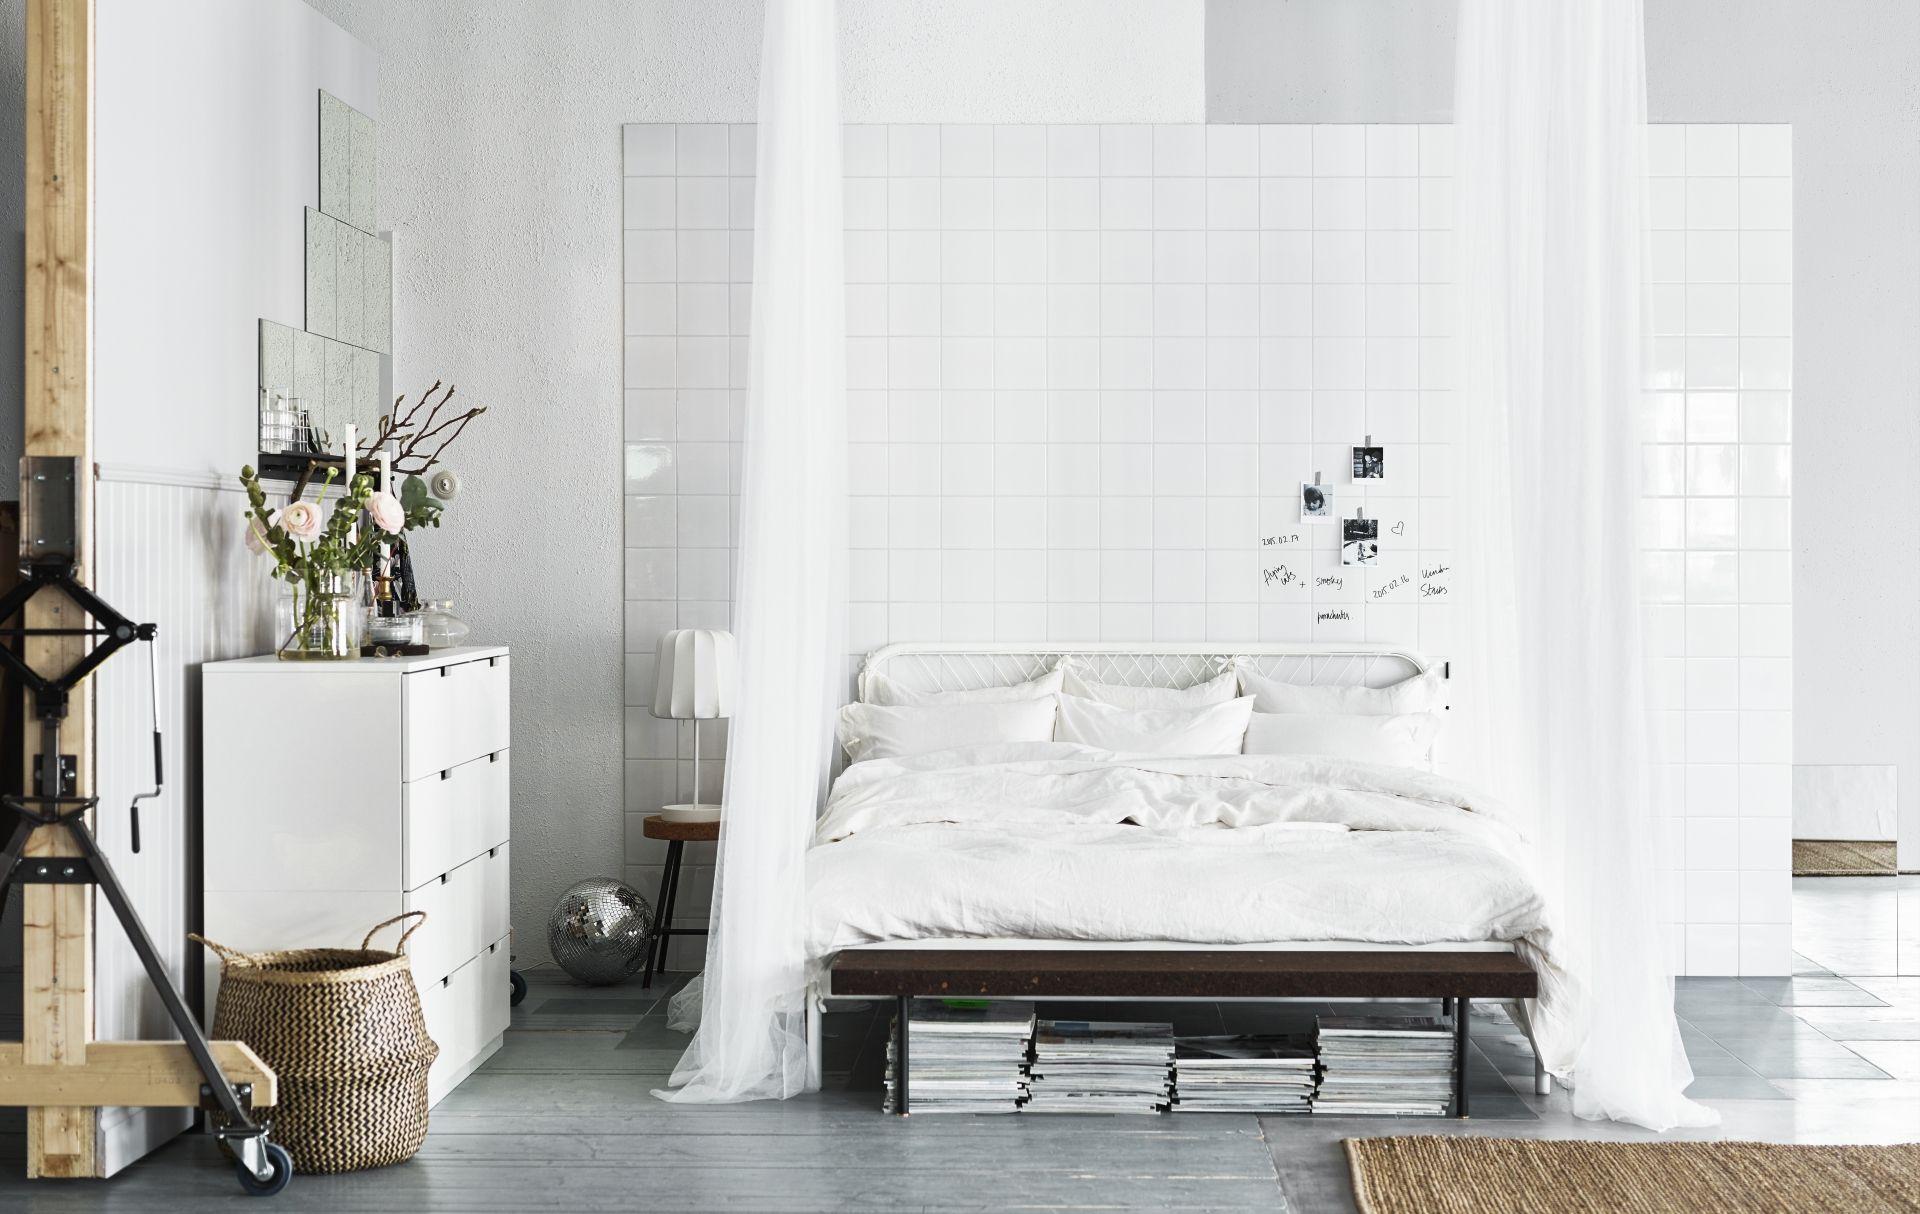 NESTTUN Bedframe, wit, Lönset - Hemelbed gordijnen, Hemelbed en ...